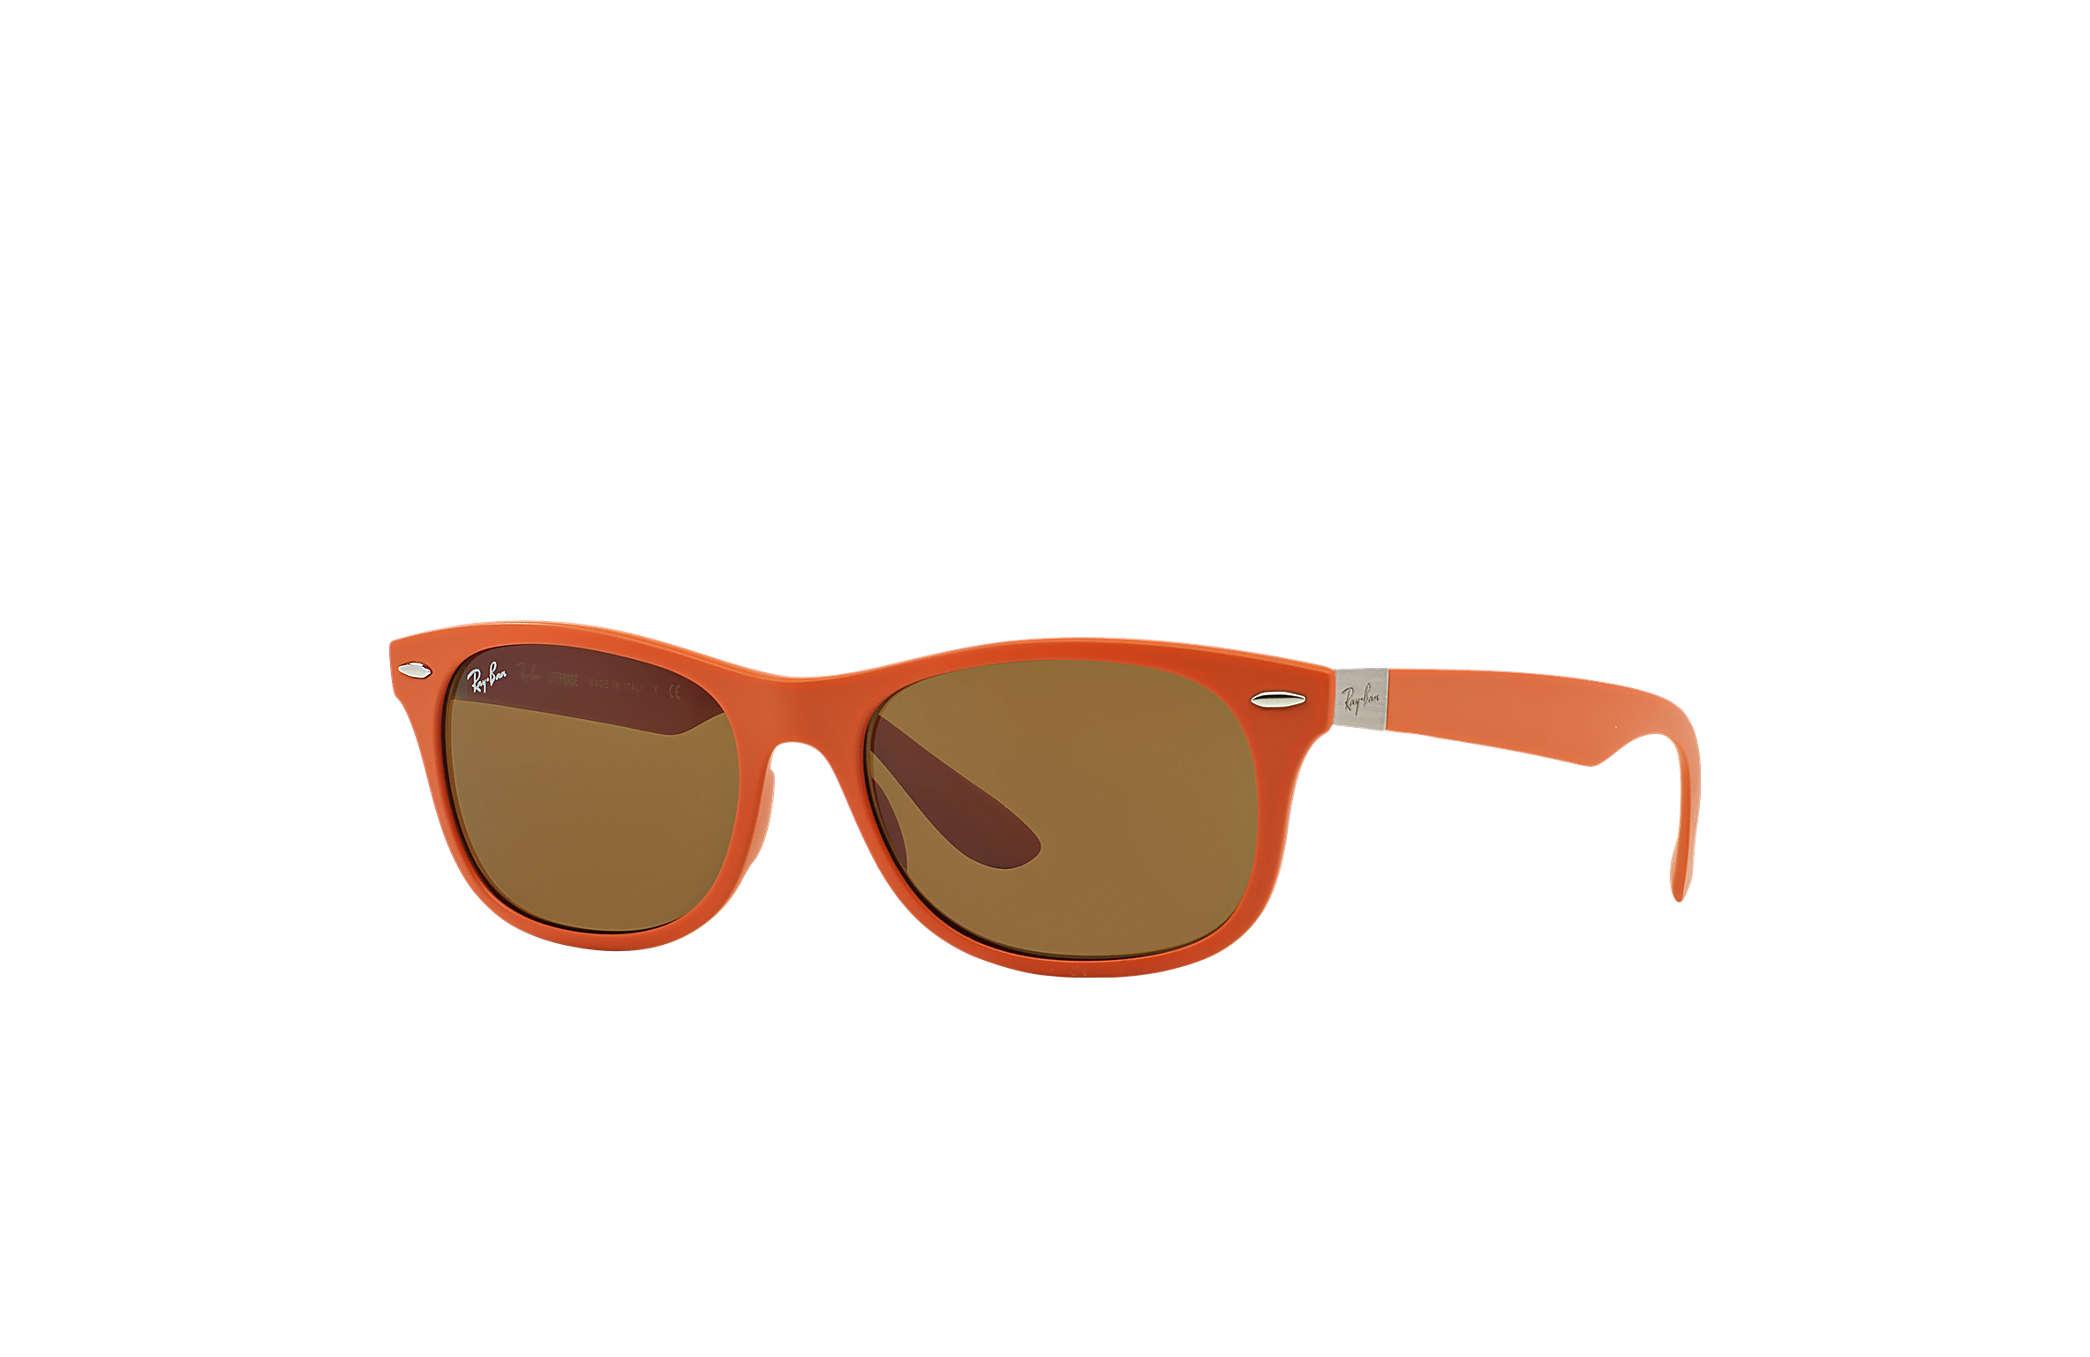 Ray-Ban New Wayfarer Liteforce RB4207 Orange - Liteforce - Gläser ...